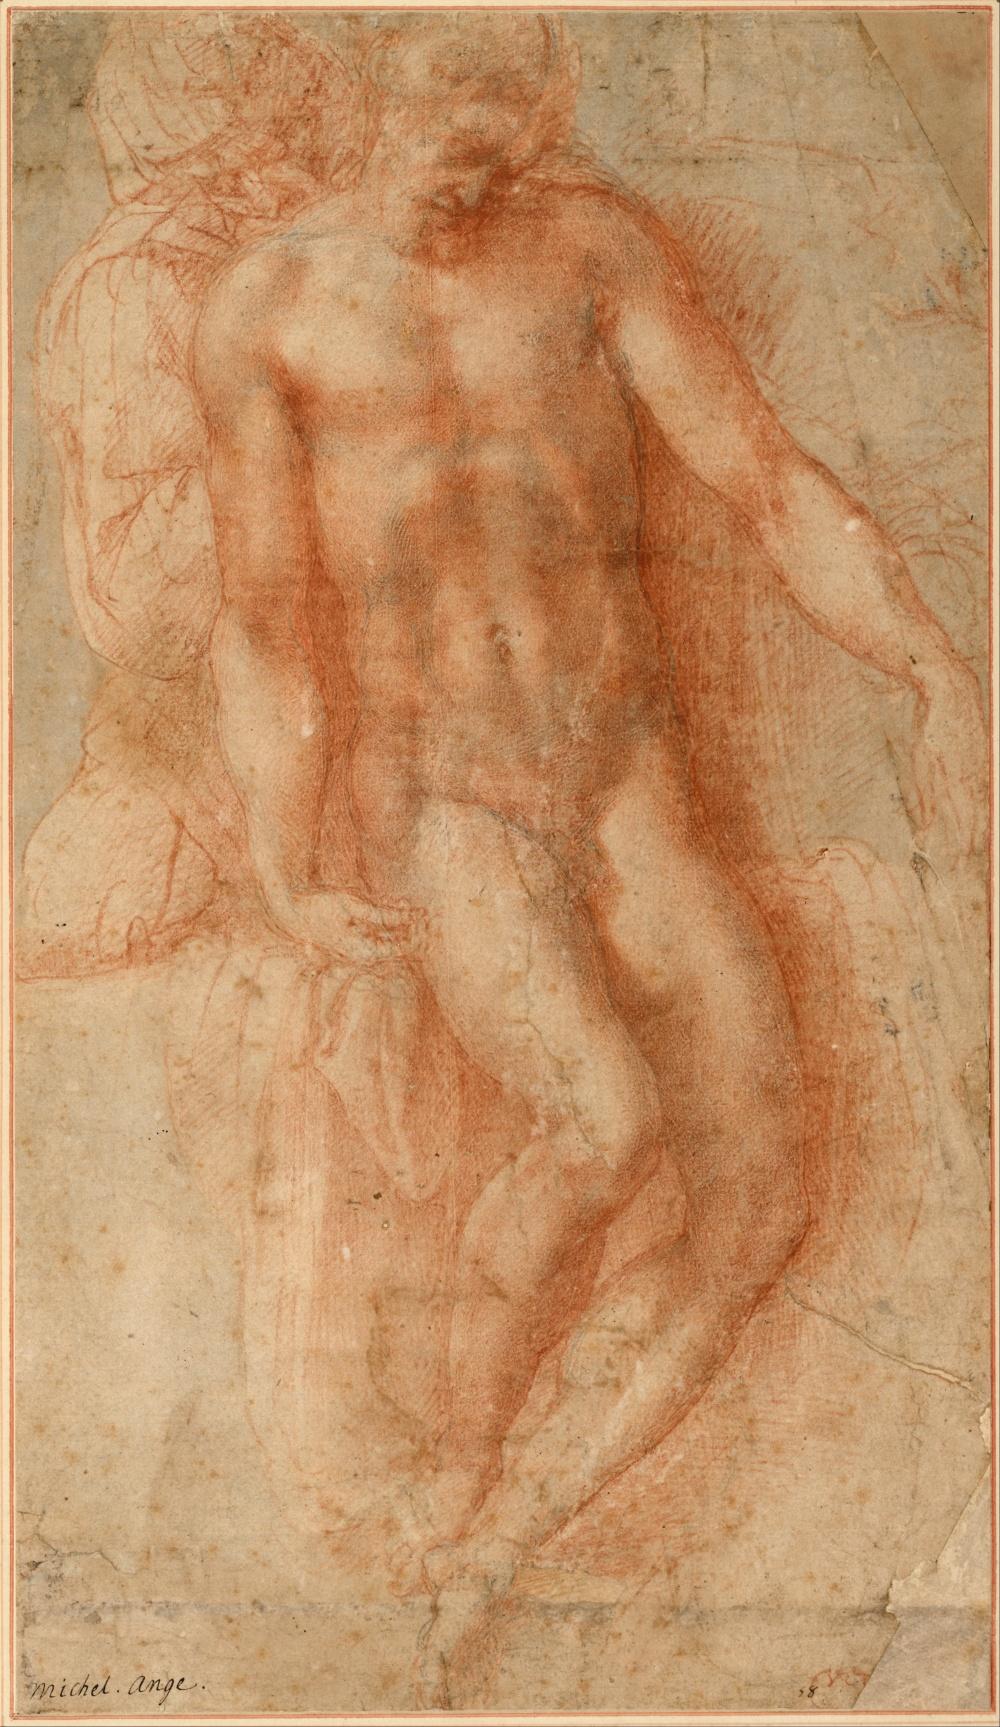 Michelangelo_Buonarroti_-_Pietà,_c.1530-1536_-_Google_Art_Project